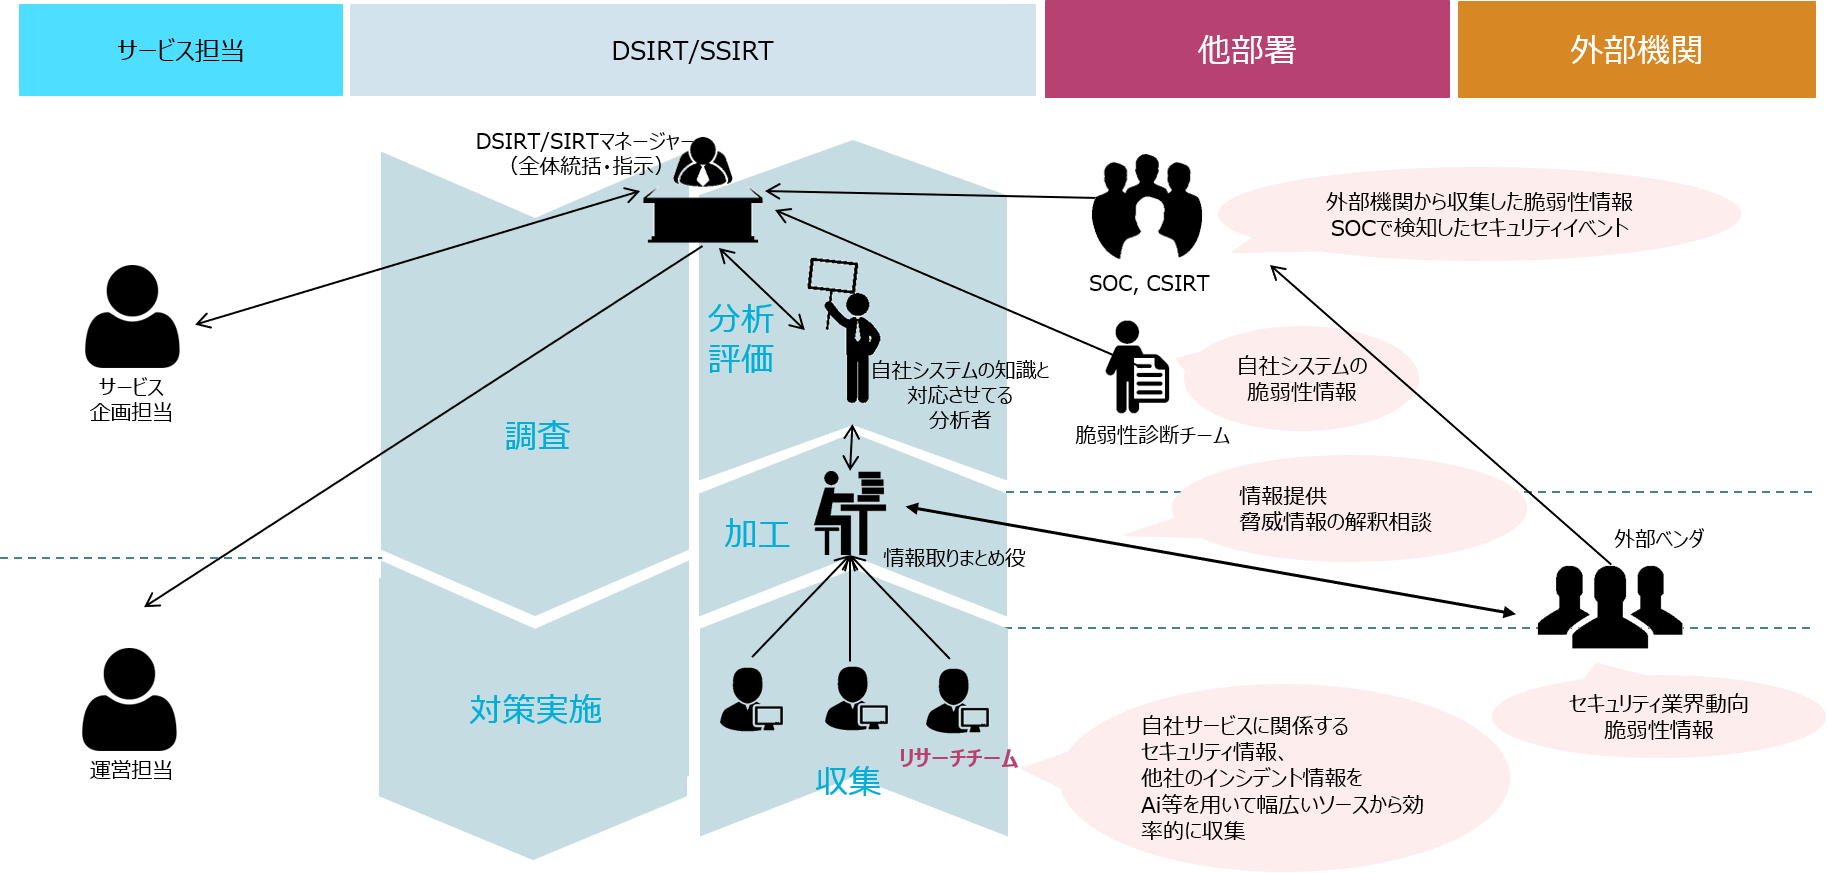 Secure SketCH_デジタルサービスリスク分析体制の役割・情報収集のサイクル例